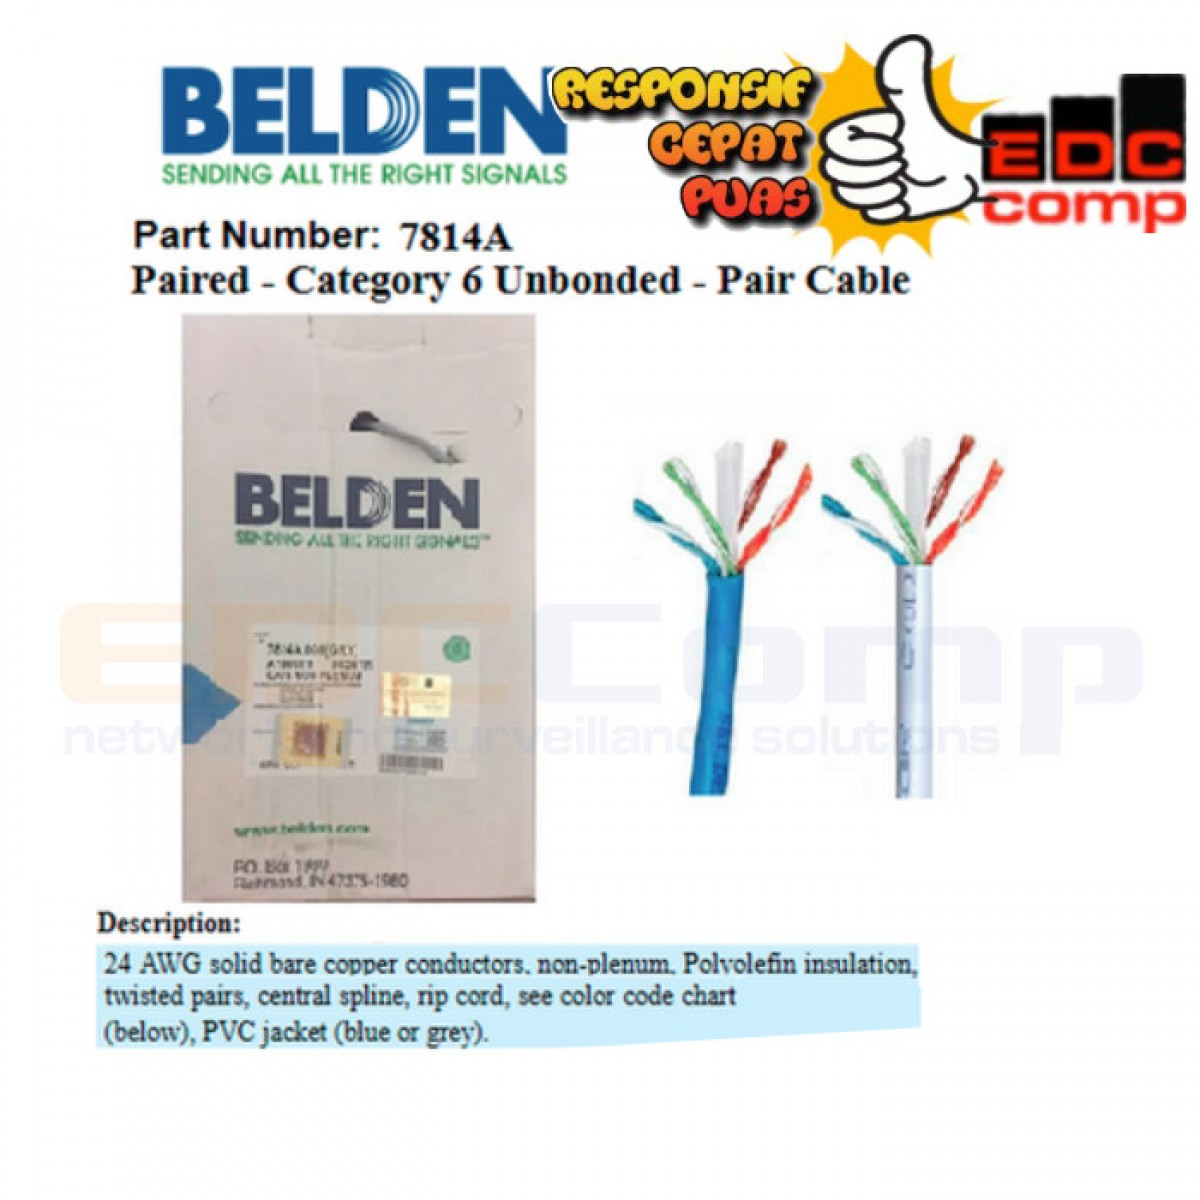 Cable UTP Cat.6 BELDEN 7814A Original Roll/Box/305M - Grey - EdcComp